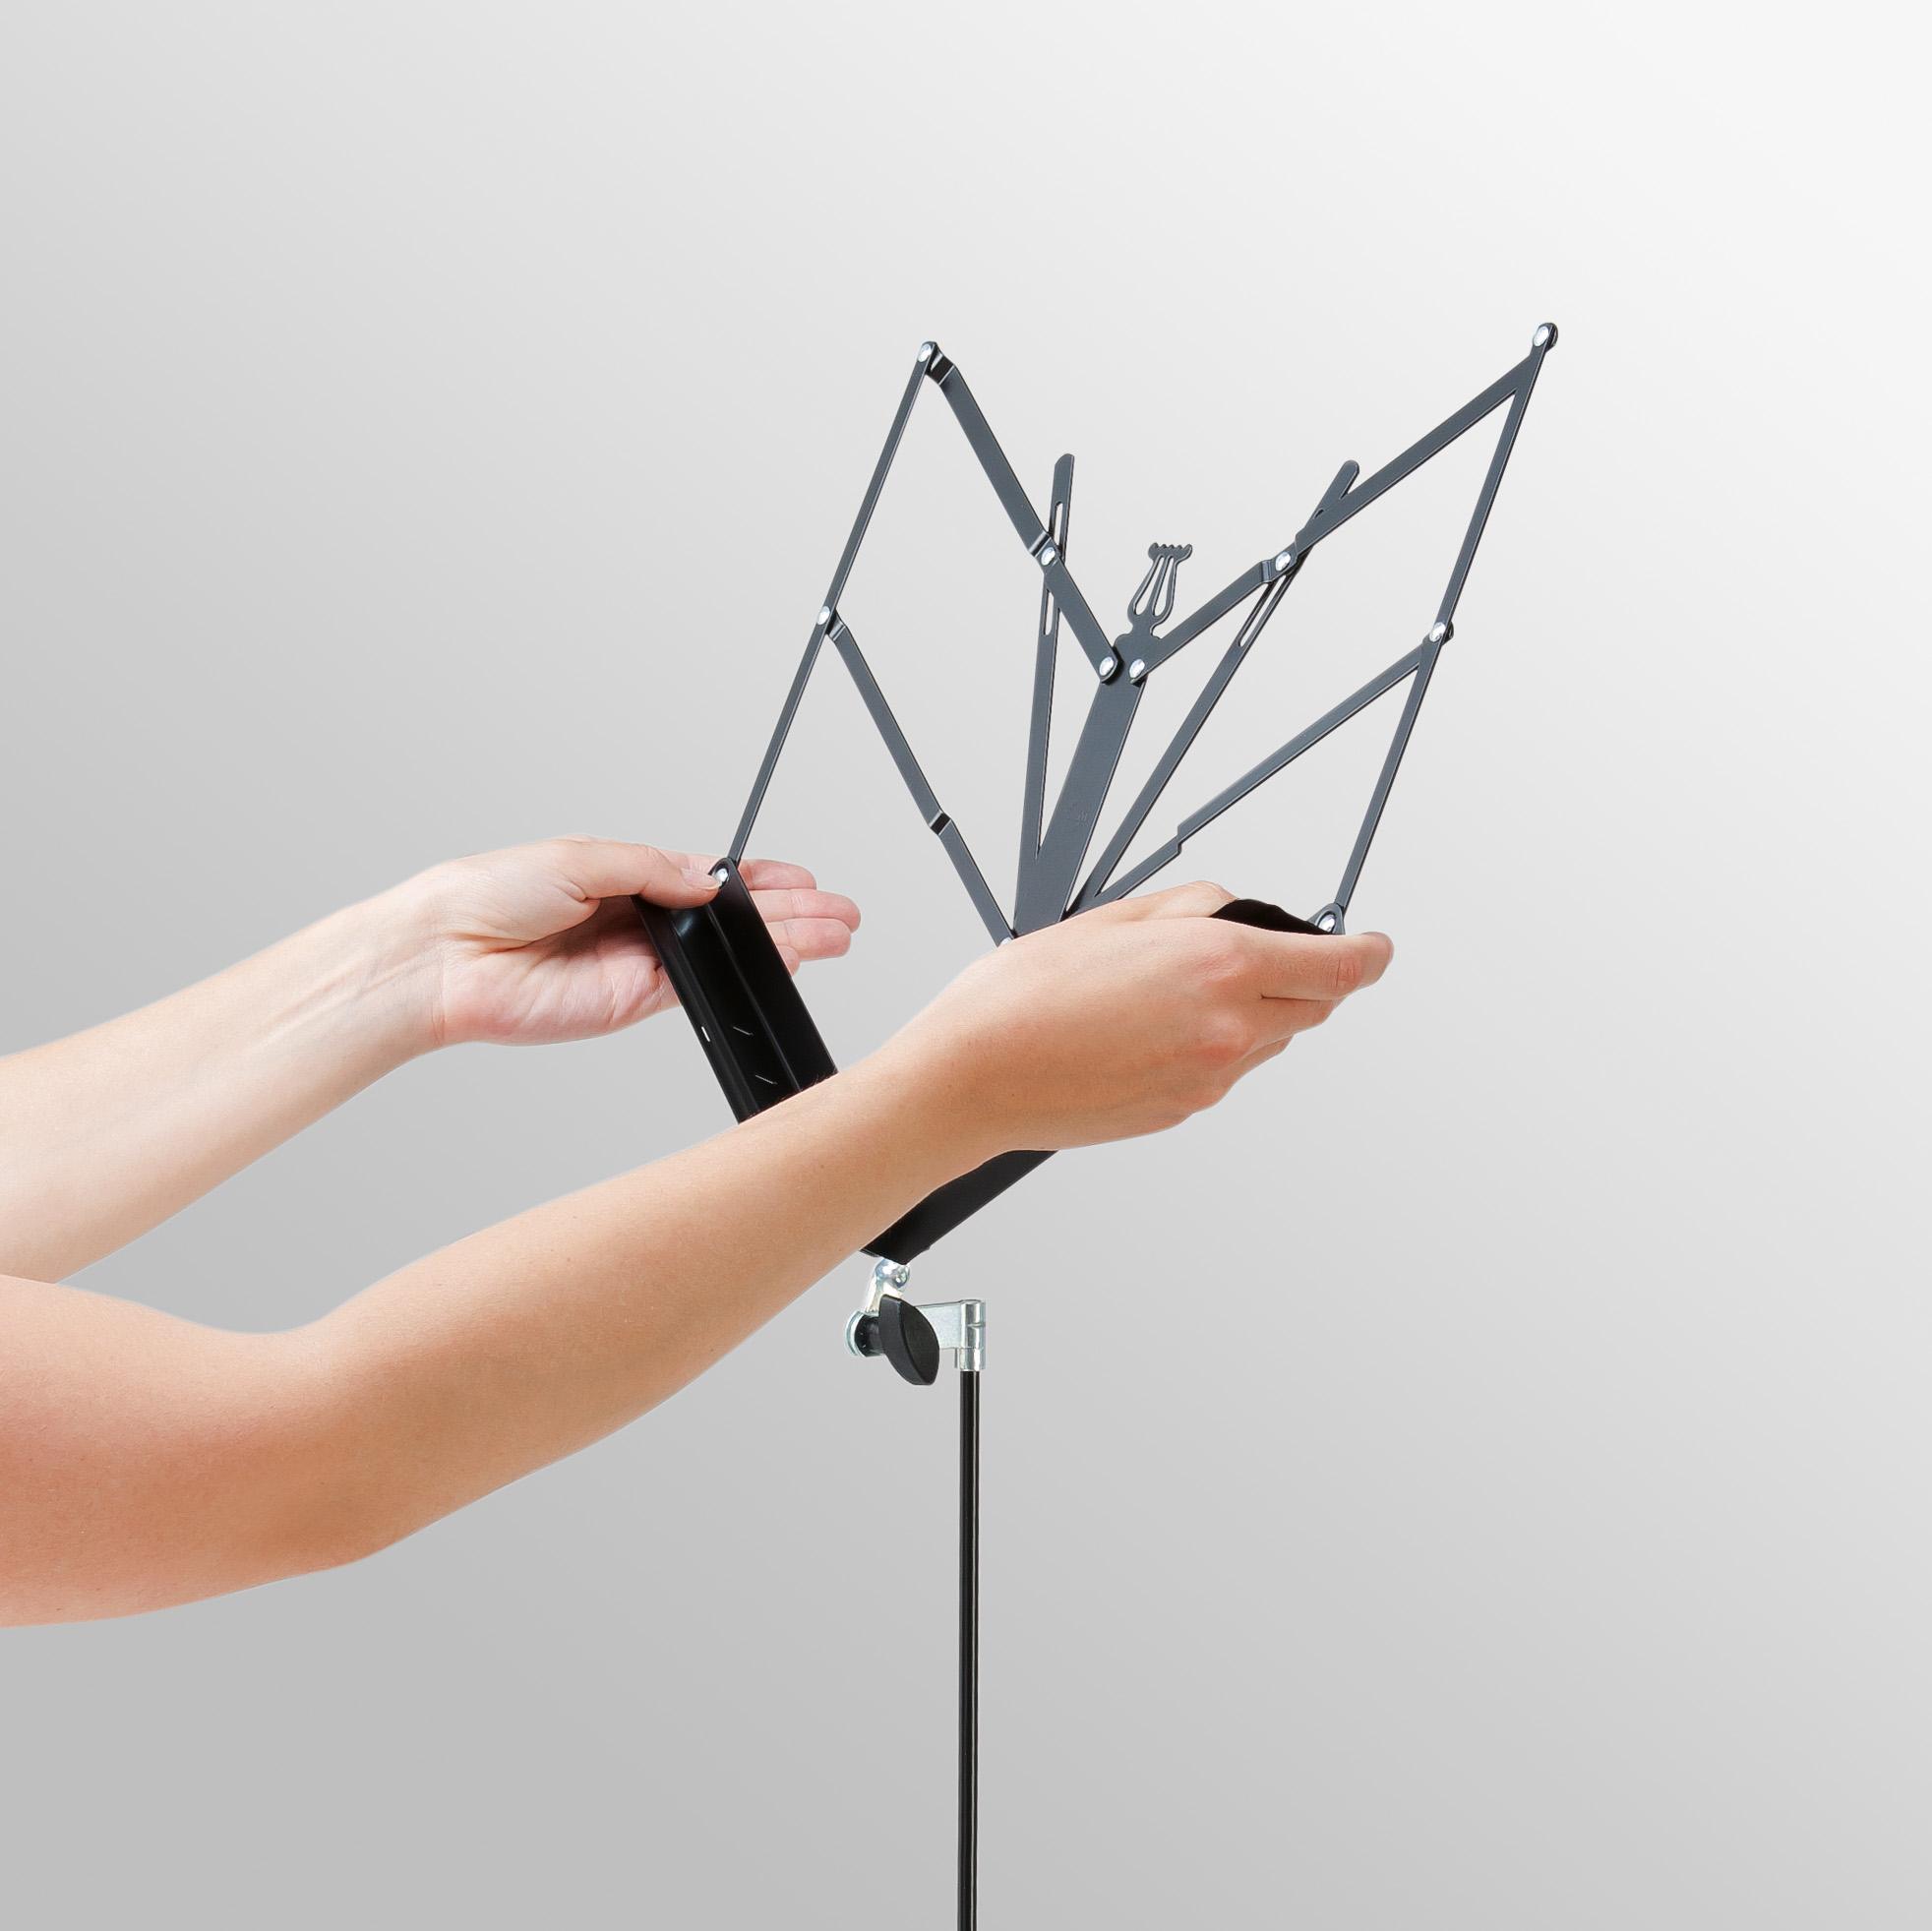 Three Piece Folding Music Stand Black K/&M 10040